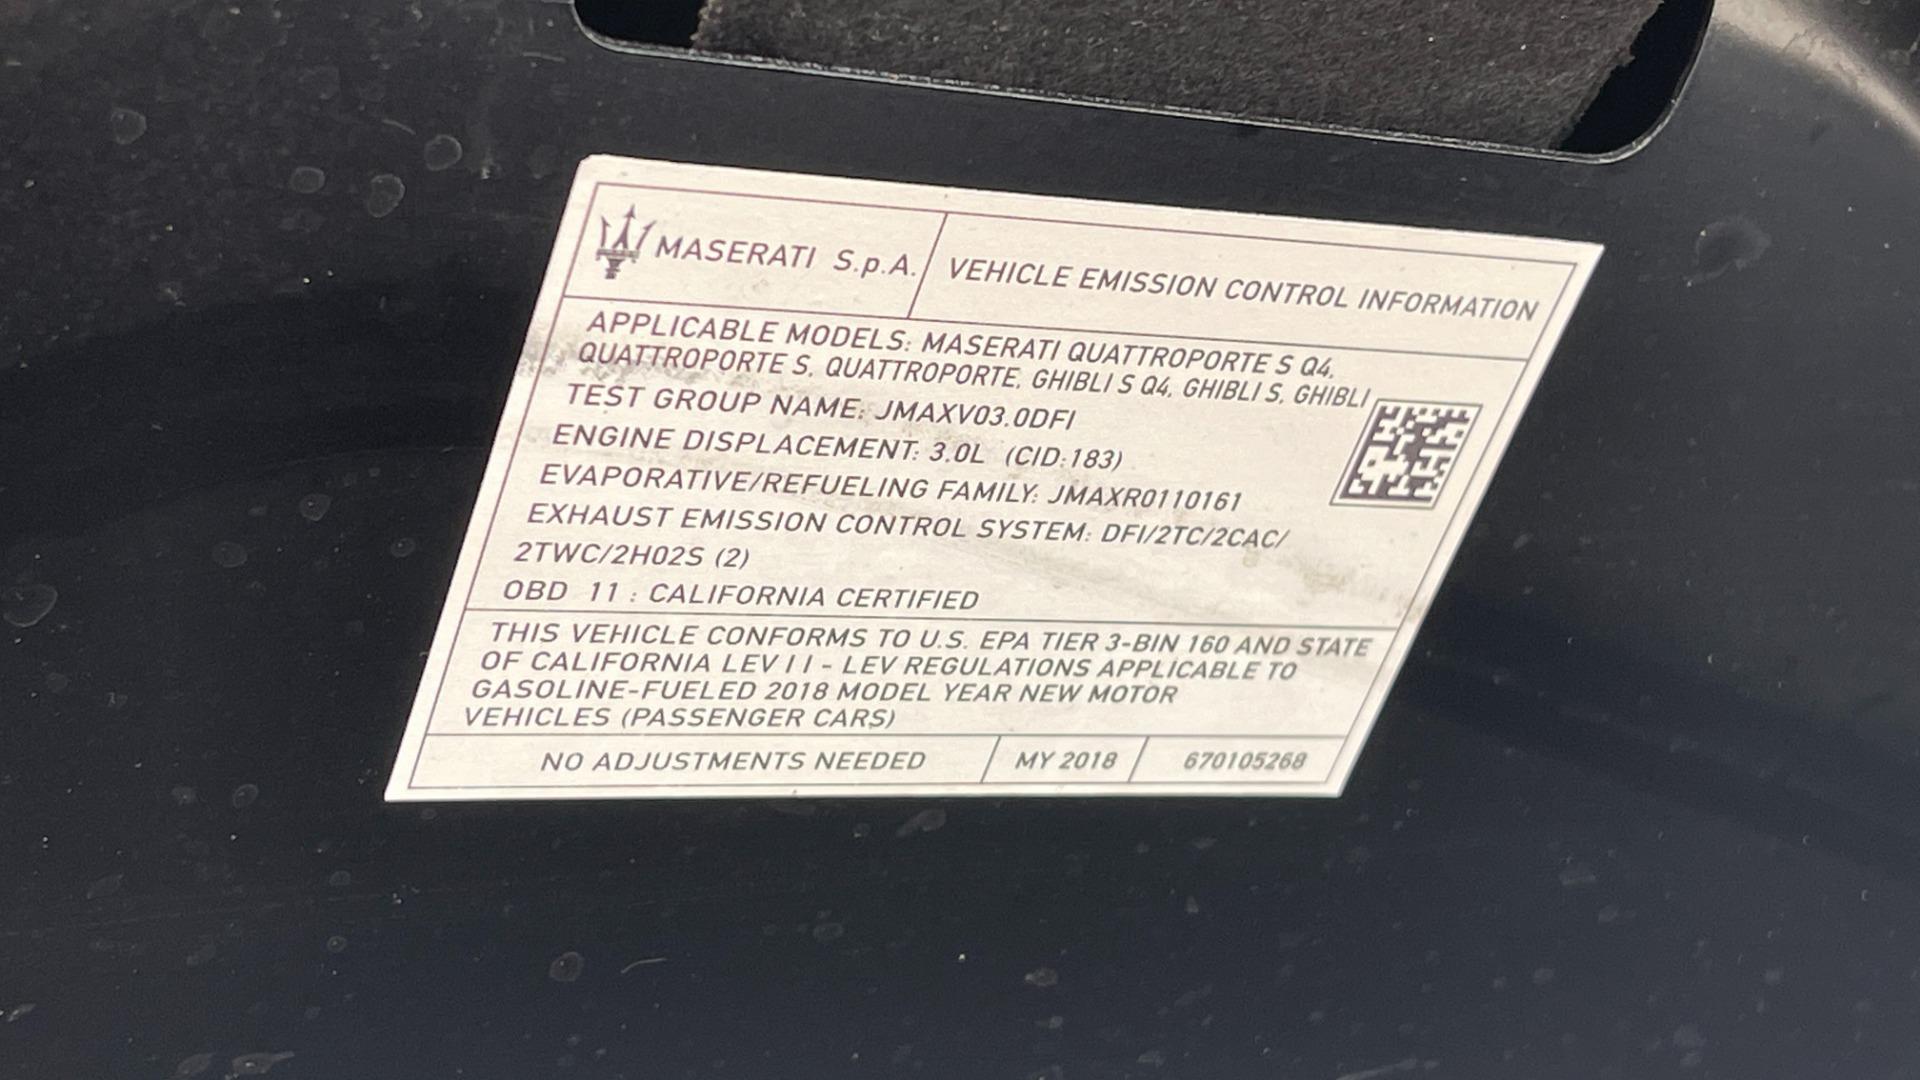 Used 2018 Maserati GHIBLI S Q4 SEDAN / AWD / 3.0L V6 / SUNROOF / NAV / REARVIEW for sale $51,995 at Formula Imports in Charlotte NC 28227 7